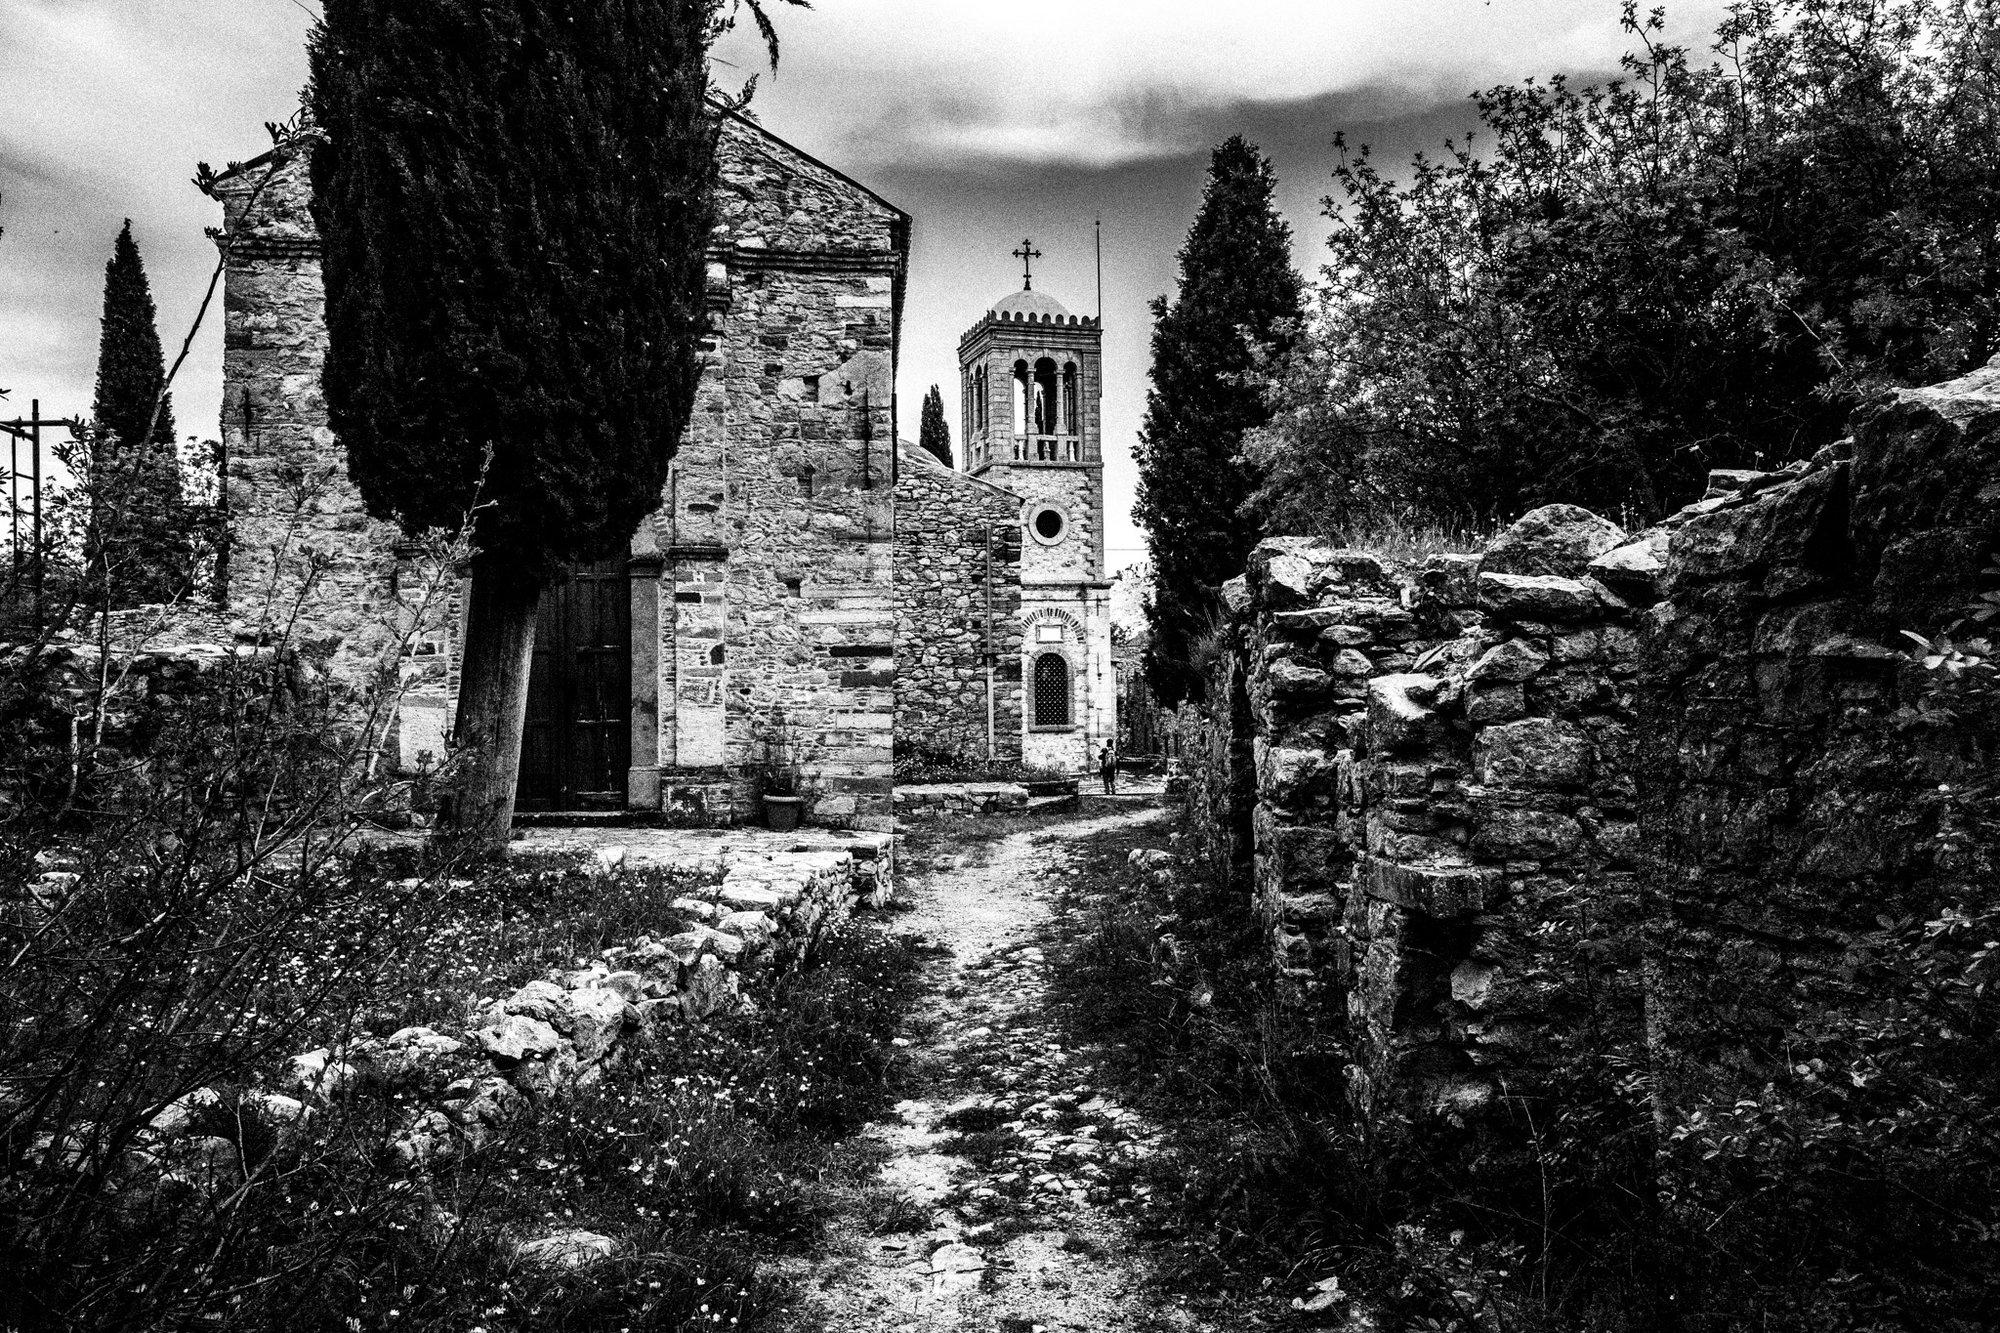 Nea Moni monastery Ελλάδα. Βόρειο Αιγαίο. Chios.